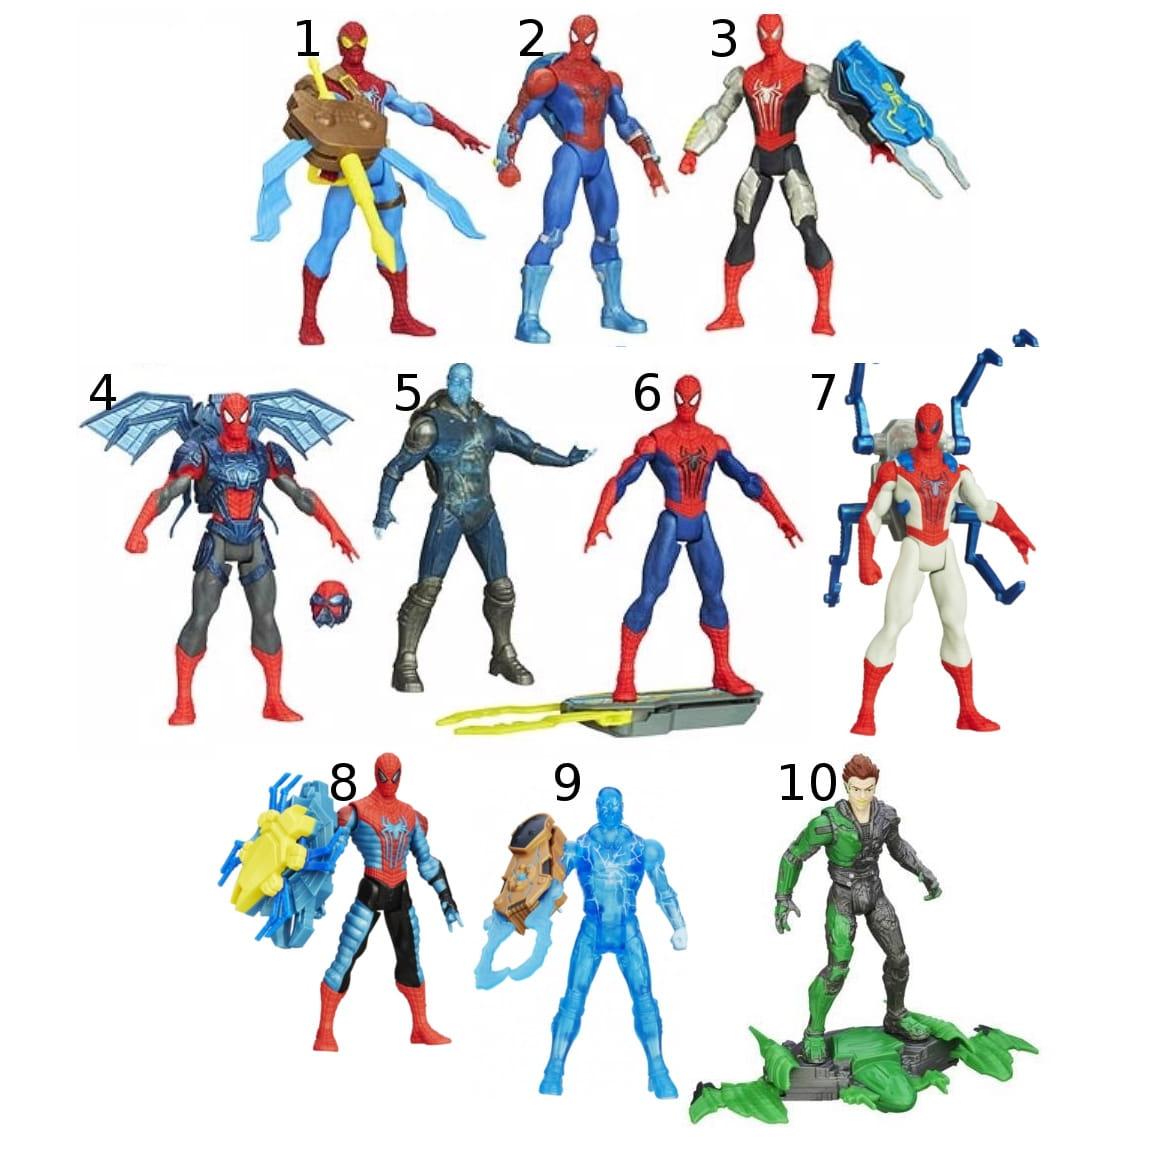 Фигурка Человека-Паука Spider-Man  9,5 см (HASBRO) - Супергерои Марвел